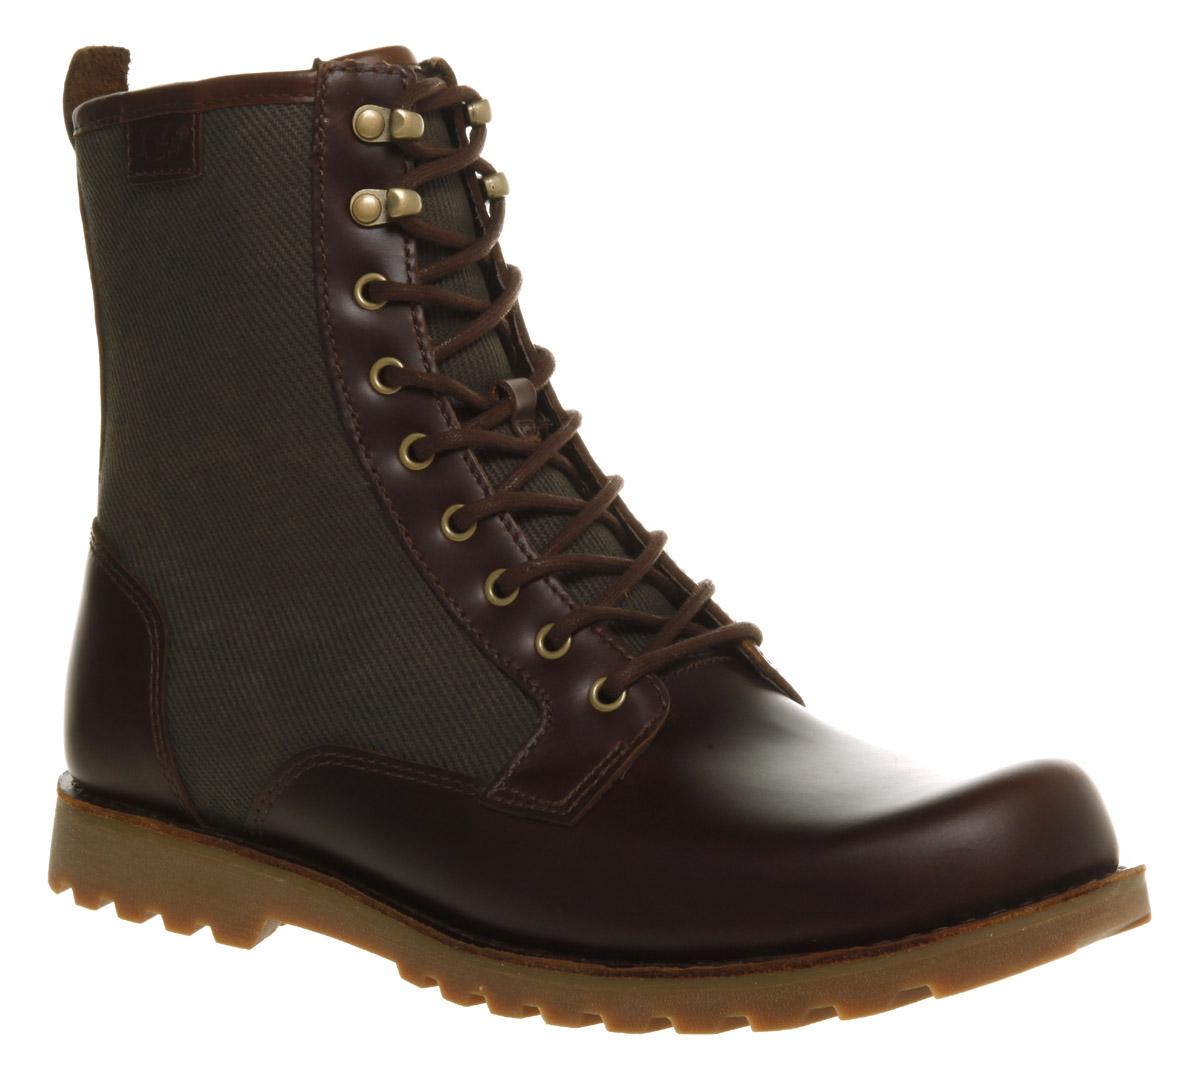 e2ba4b097c9f Leather Ugg Boots Uk Office - cheap watches mgc-gas.com